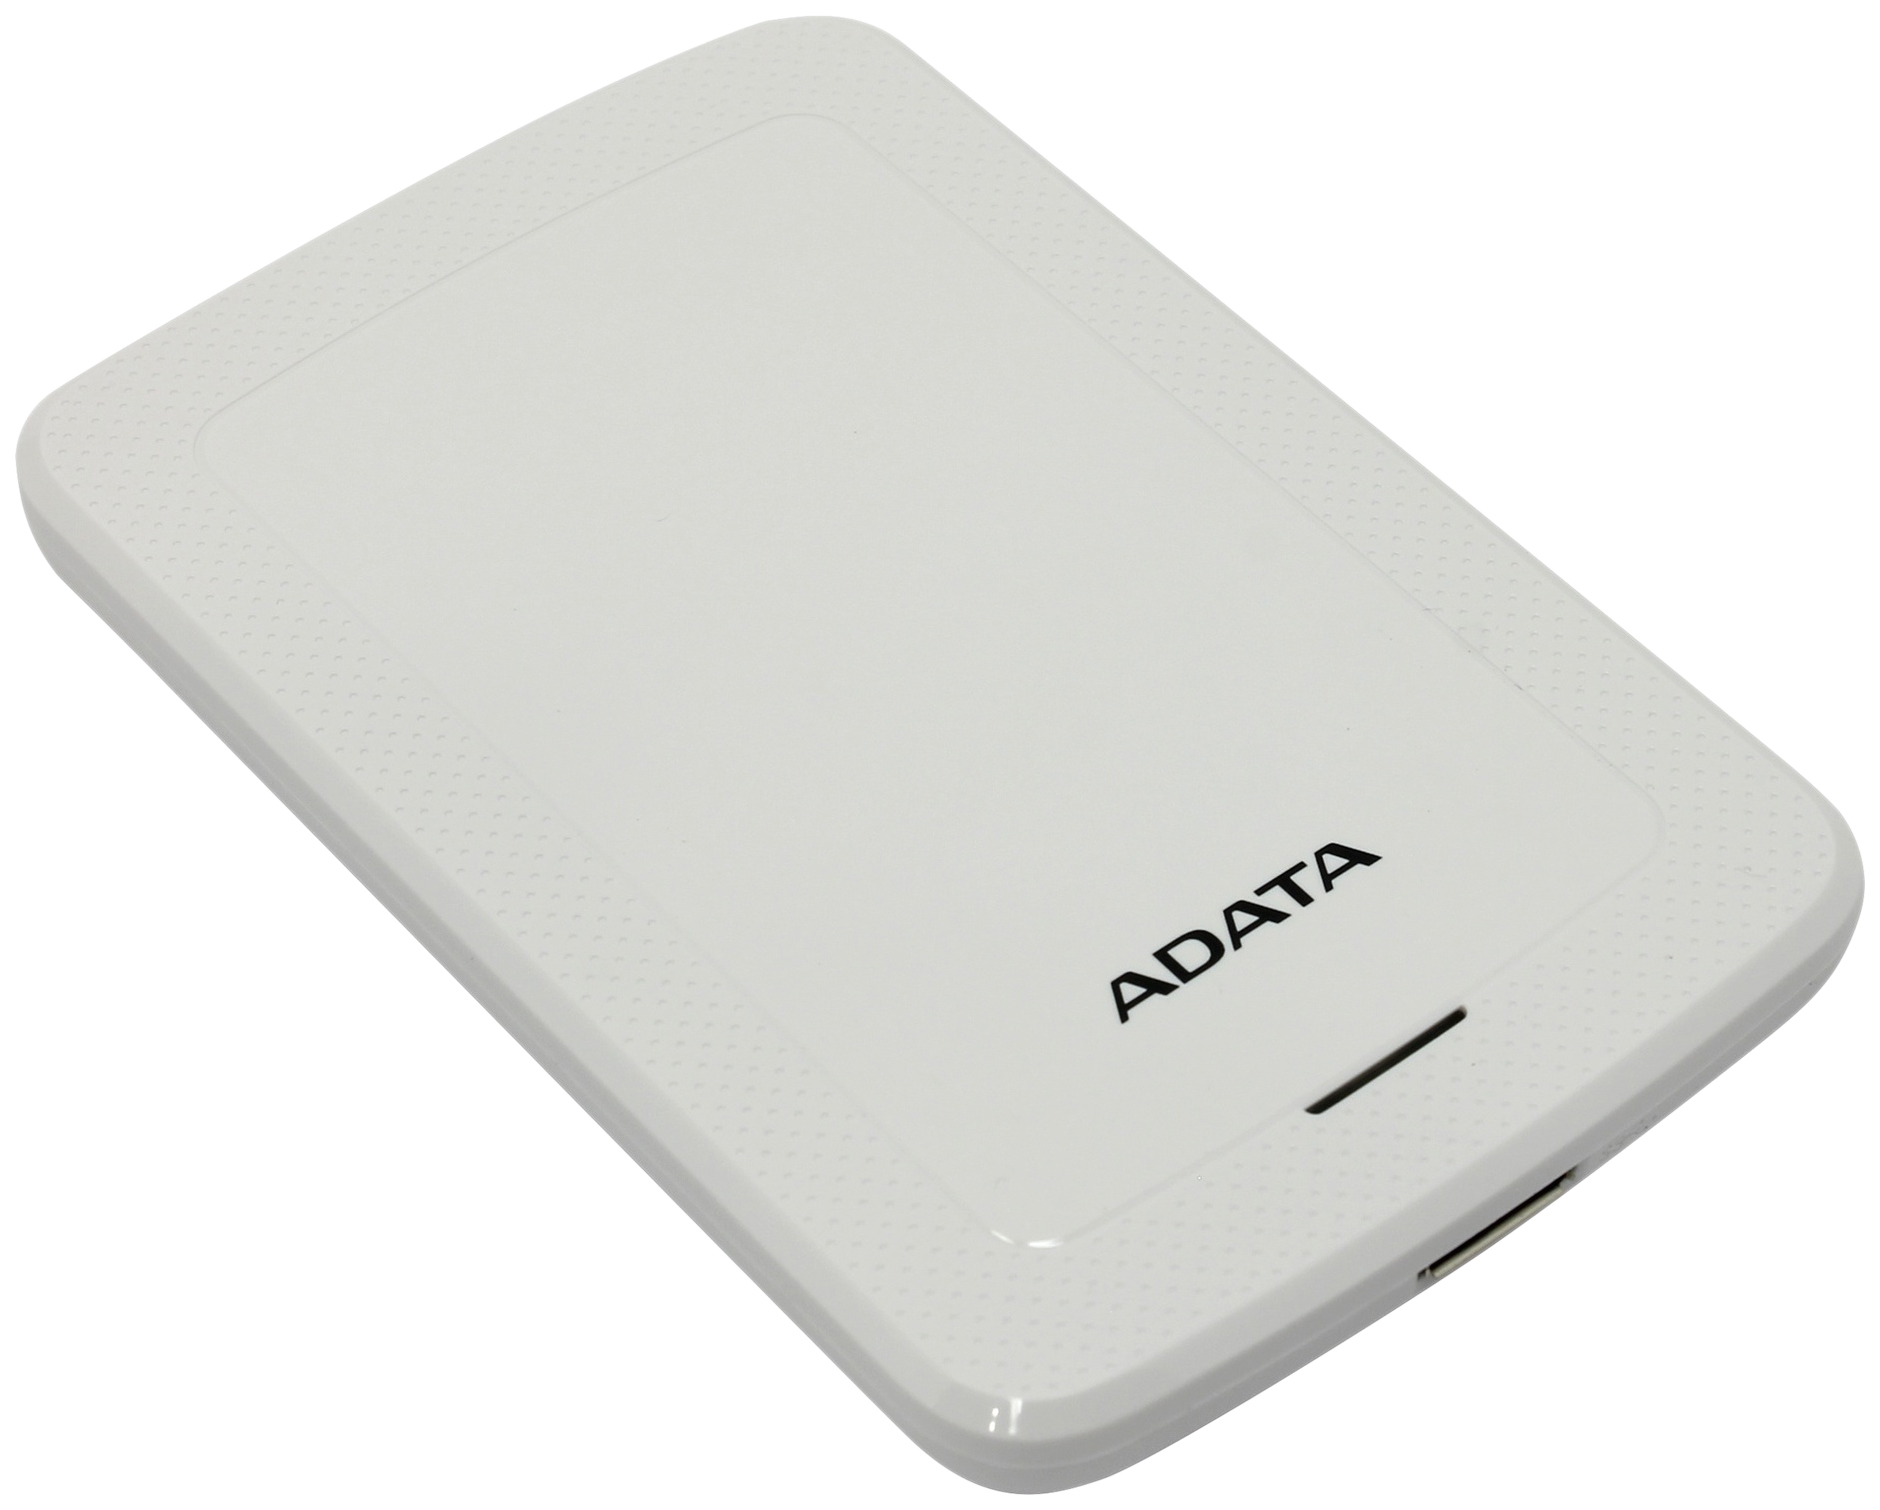 Внешний диск HDD ADATA 2TB White (AHV300